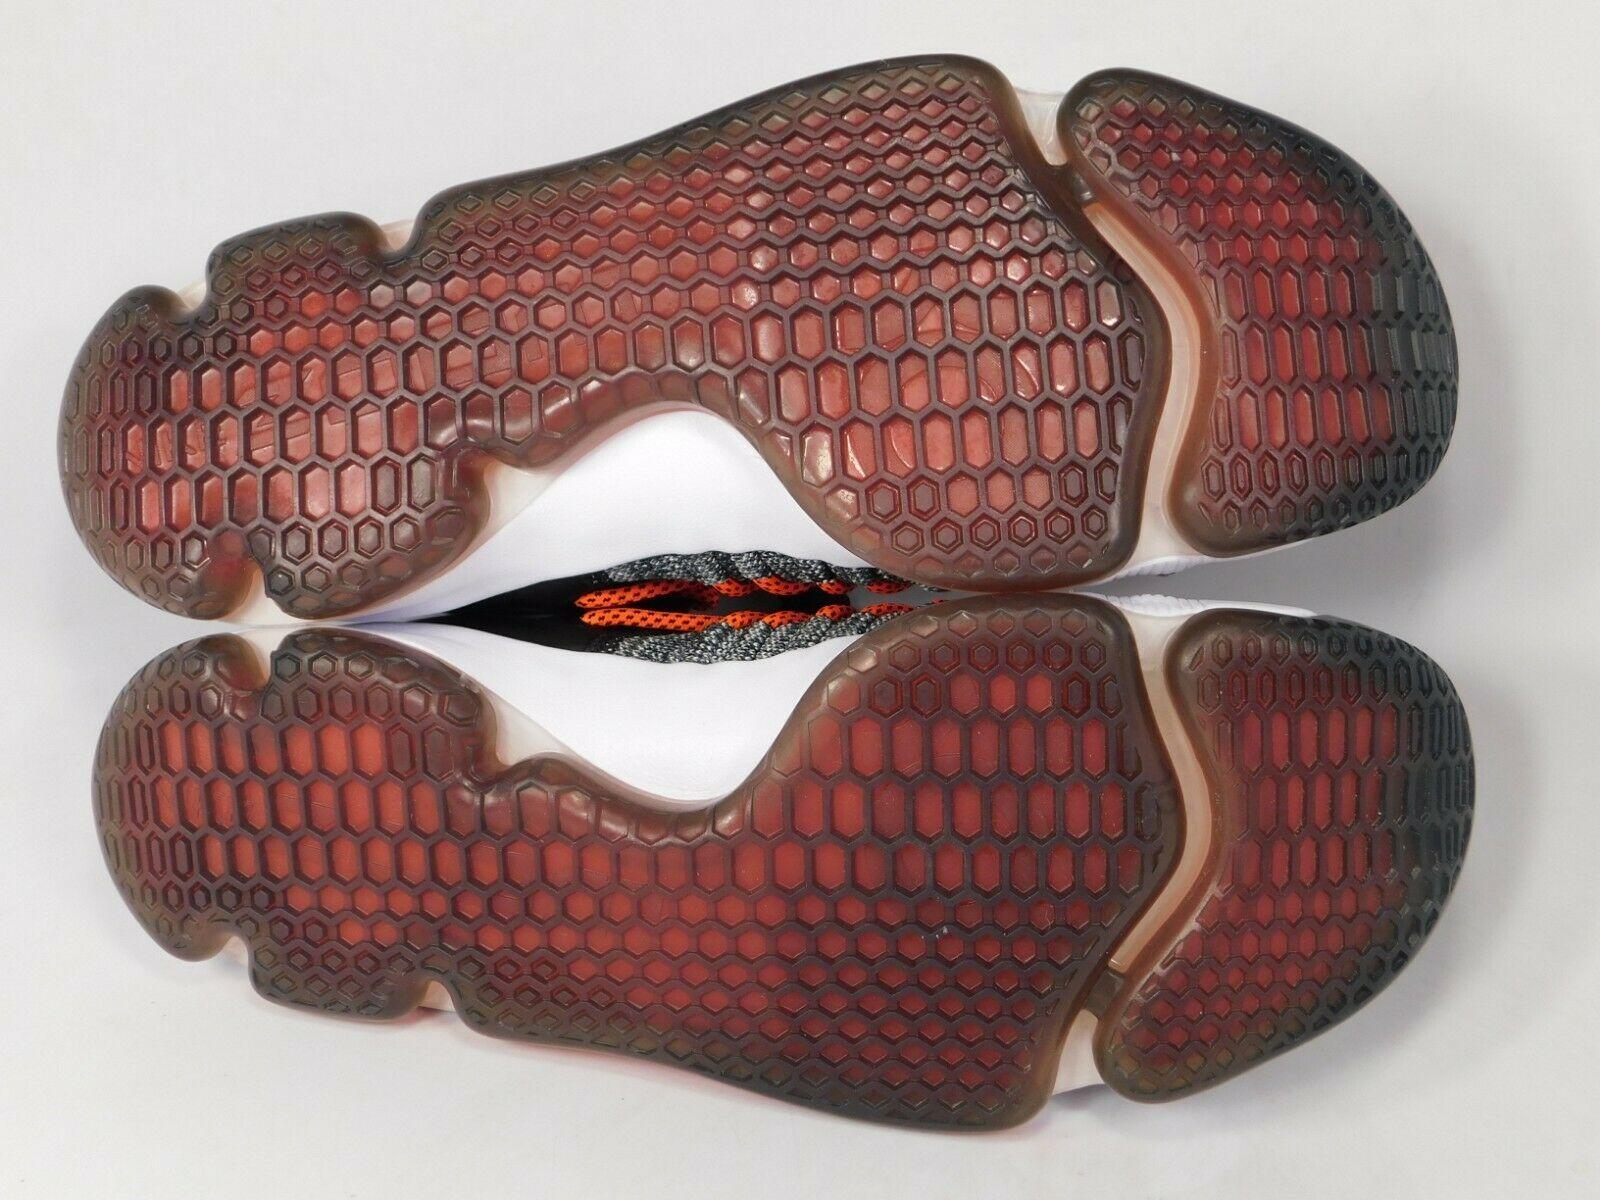 Nike Zoom Kd 9 Ix Elite Taglia US 11 M (D) and 50 similar items